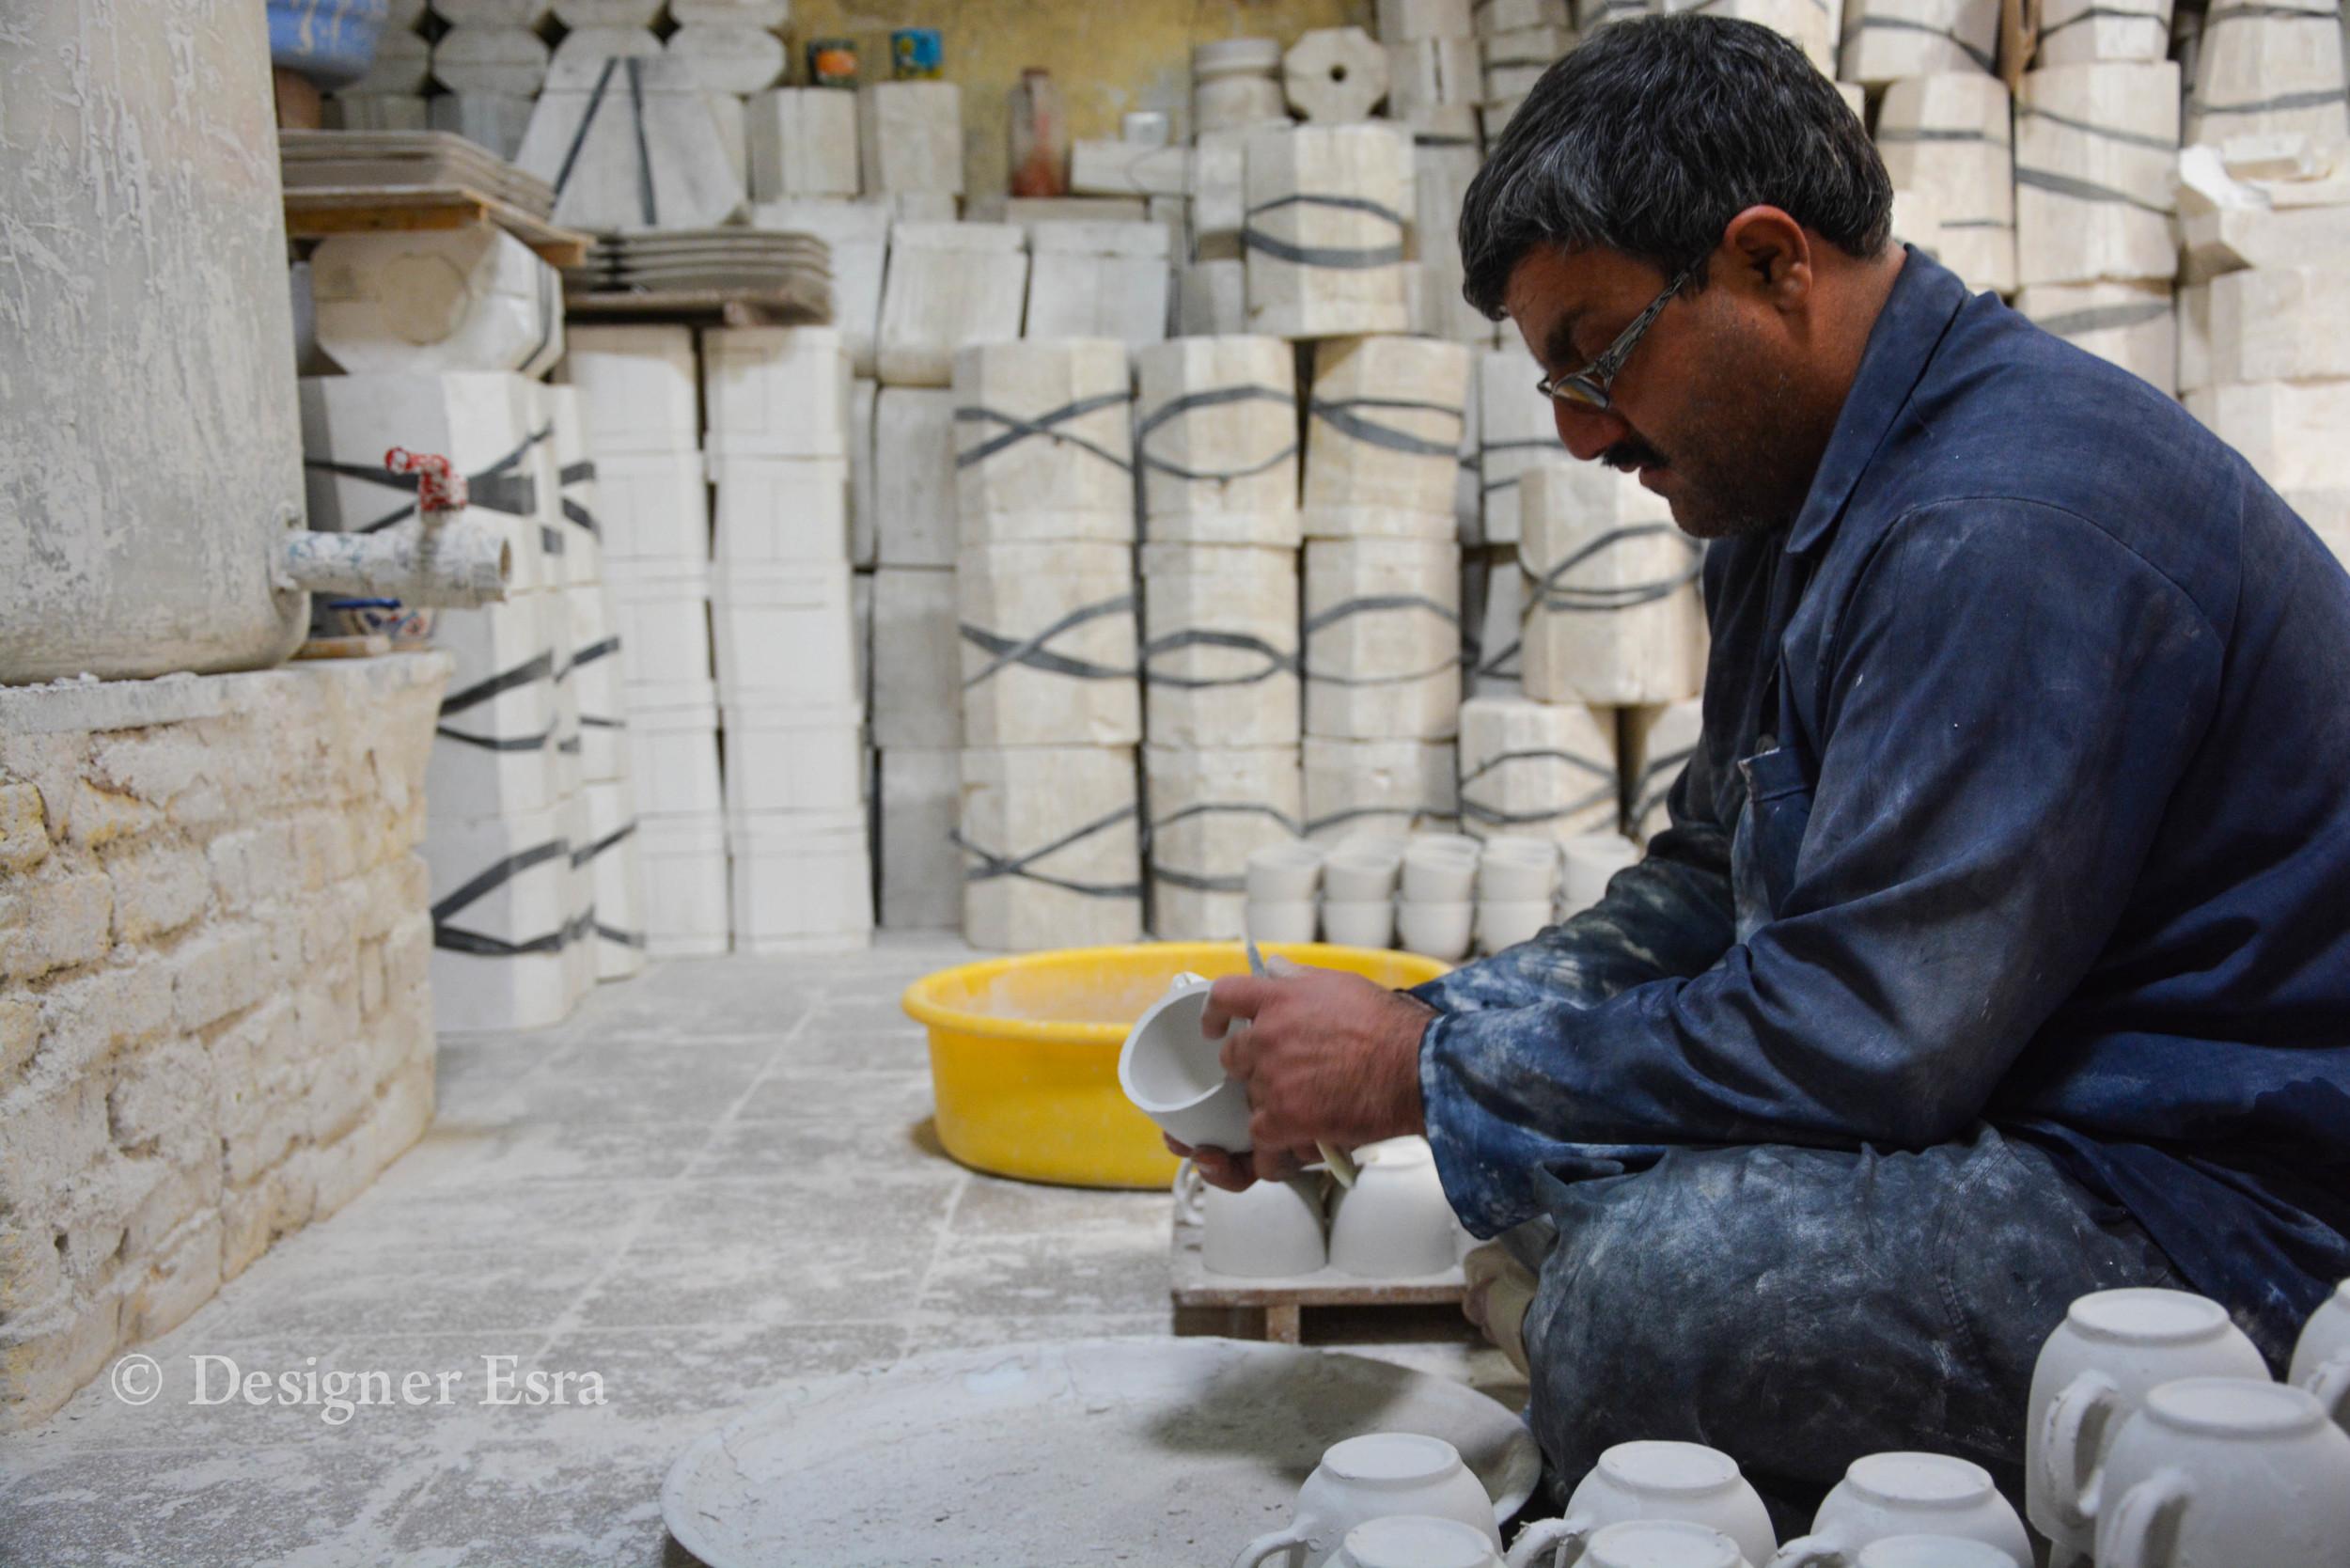 Sanding pottery in Iran